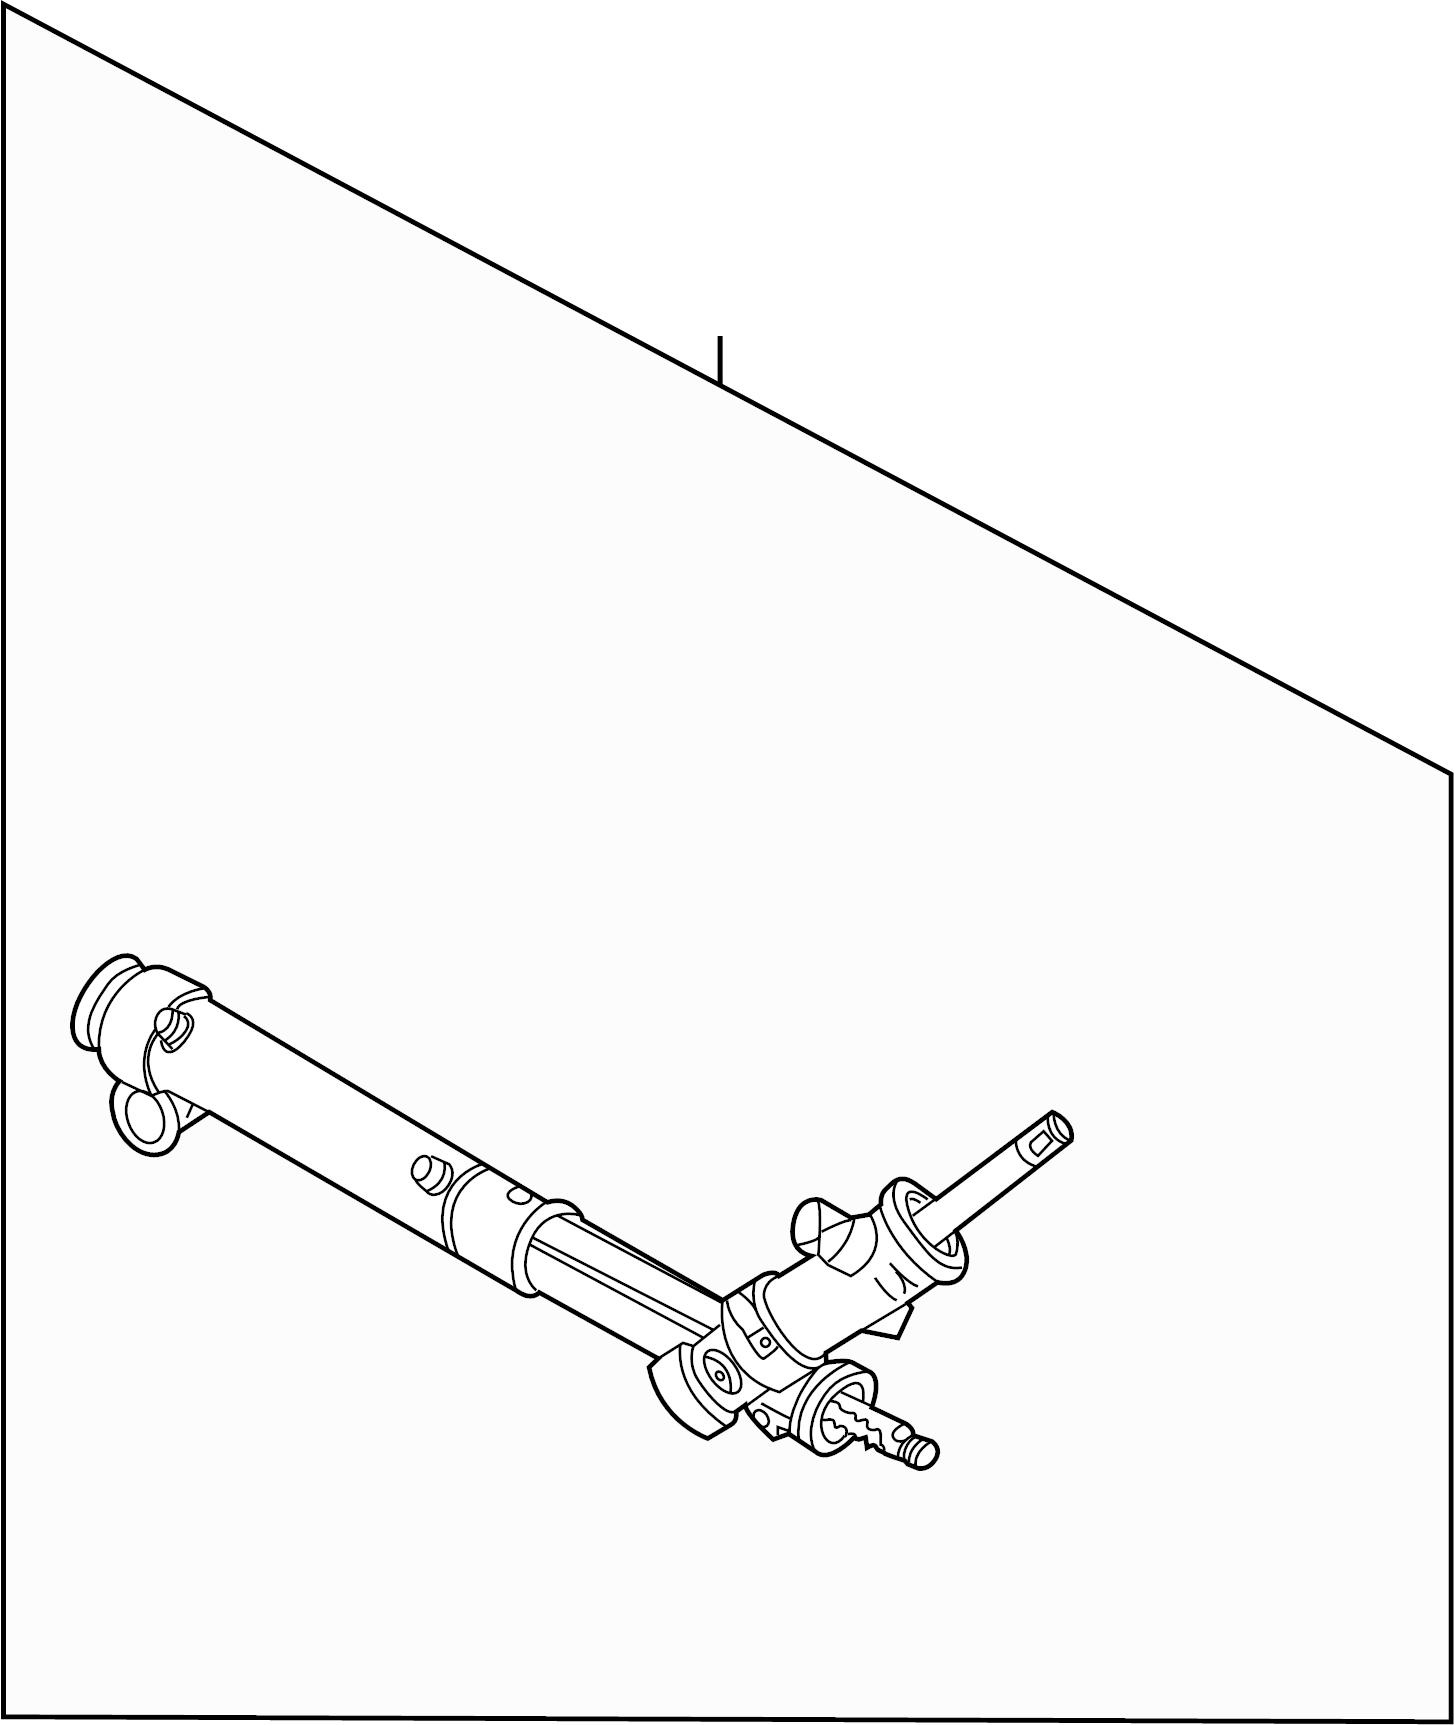 Pontiac Montana Rack And Pinion Assembly Cooler Gear